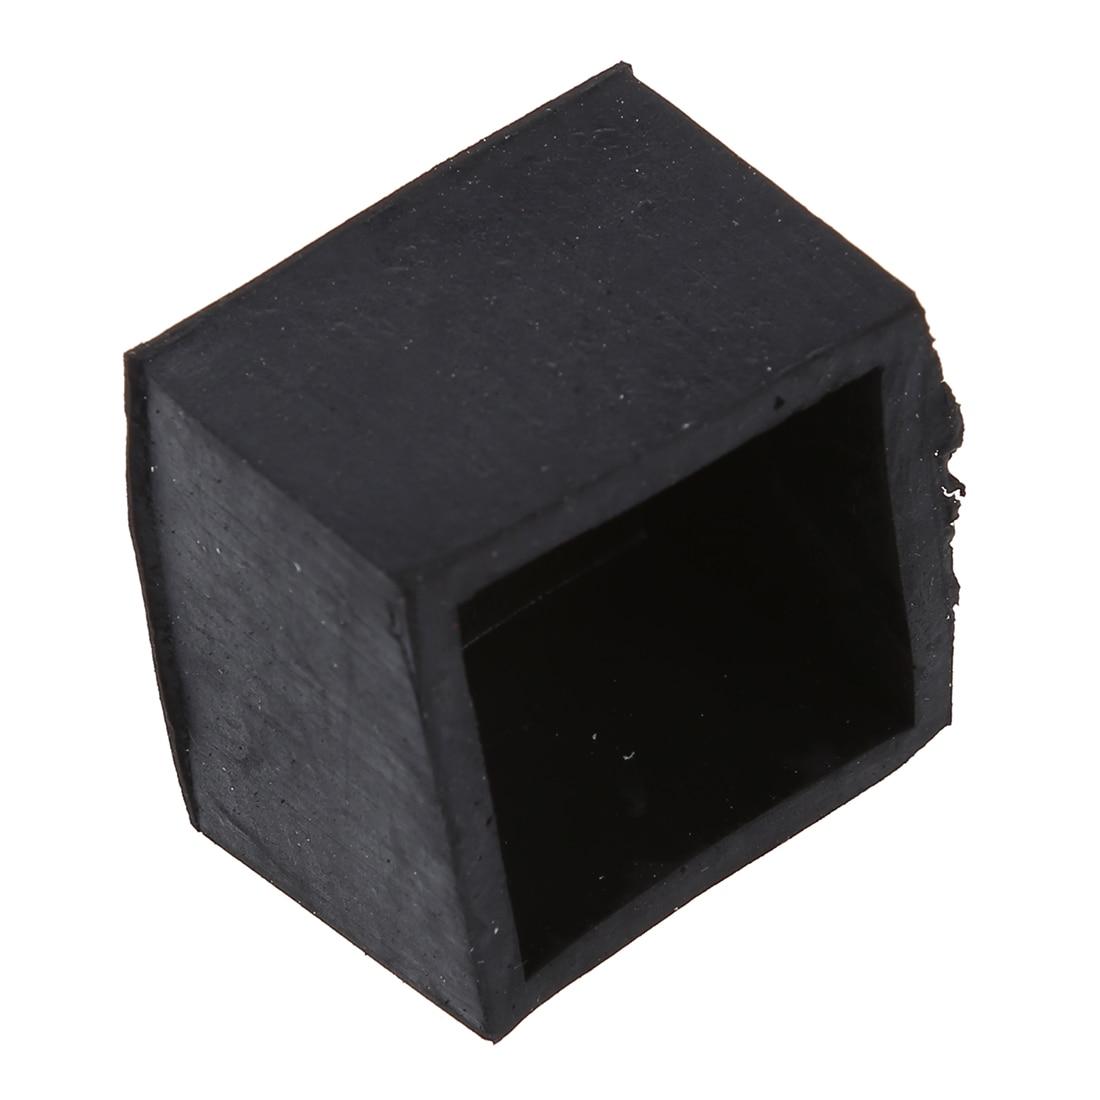 Practical 4 Pcs Black Chair Table Leg Rubber Foot Covers Protectors 28mm x 28mm